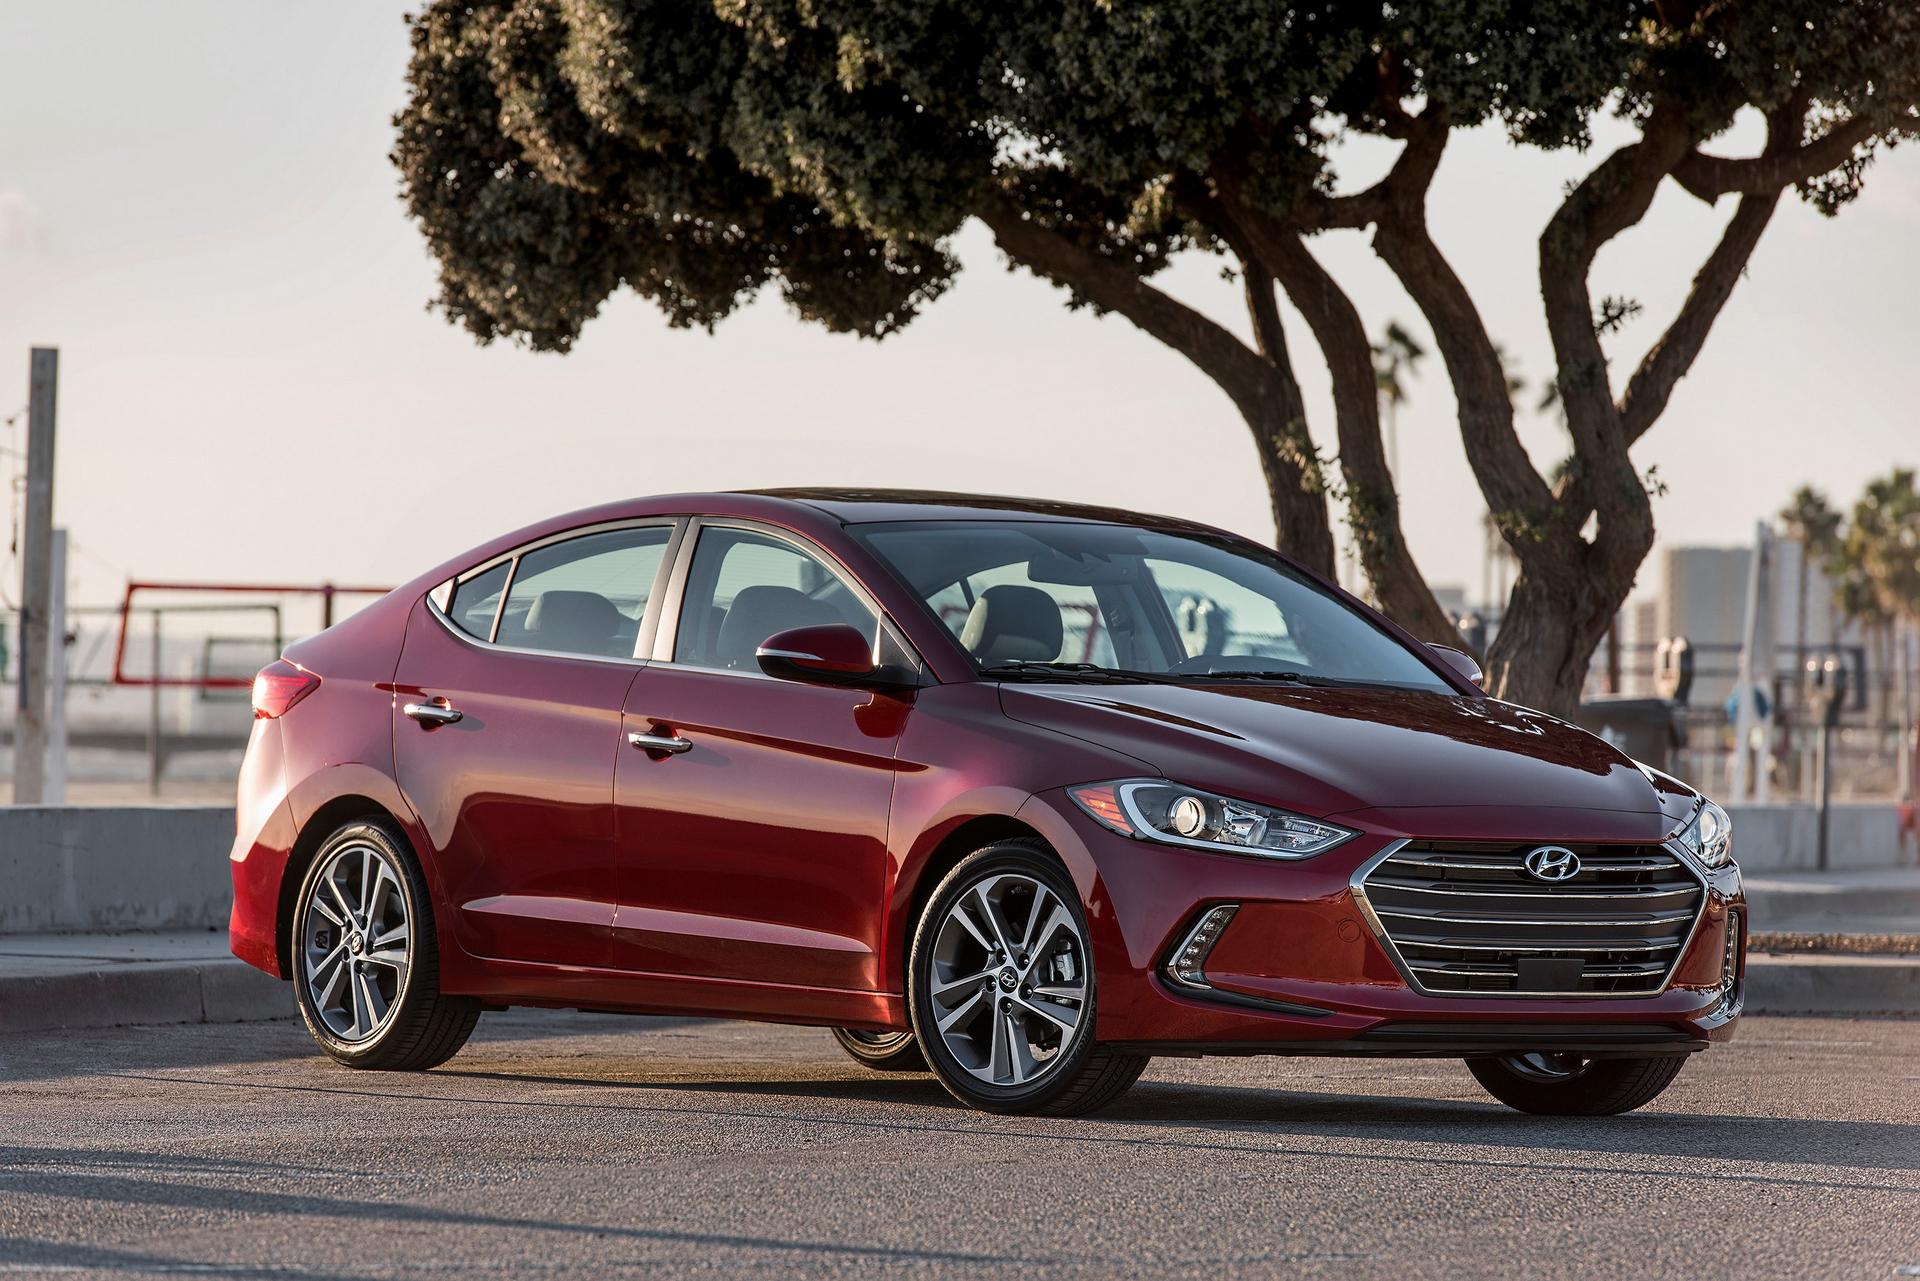 2017 Elantra Sedan © Hyundai Motor Company